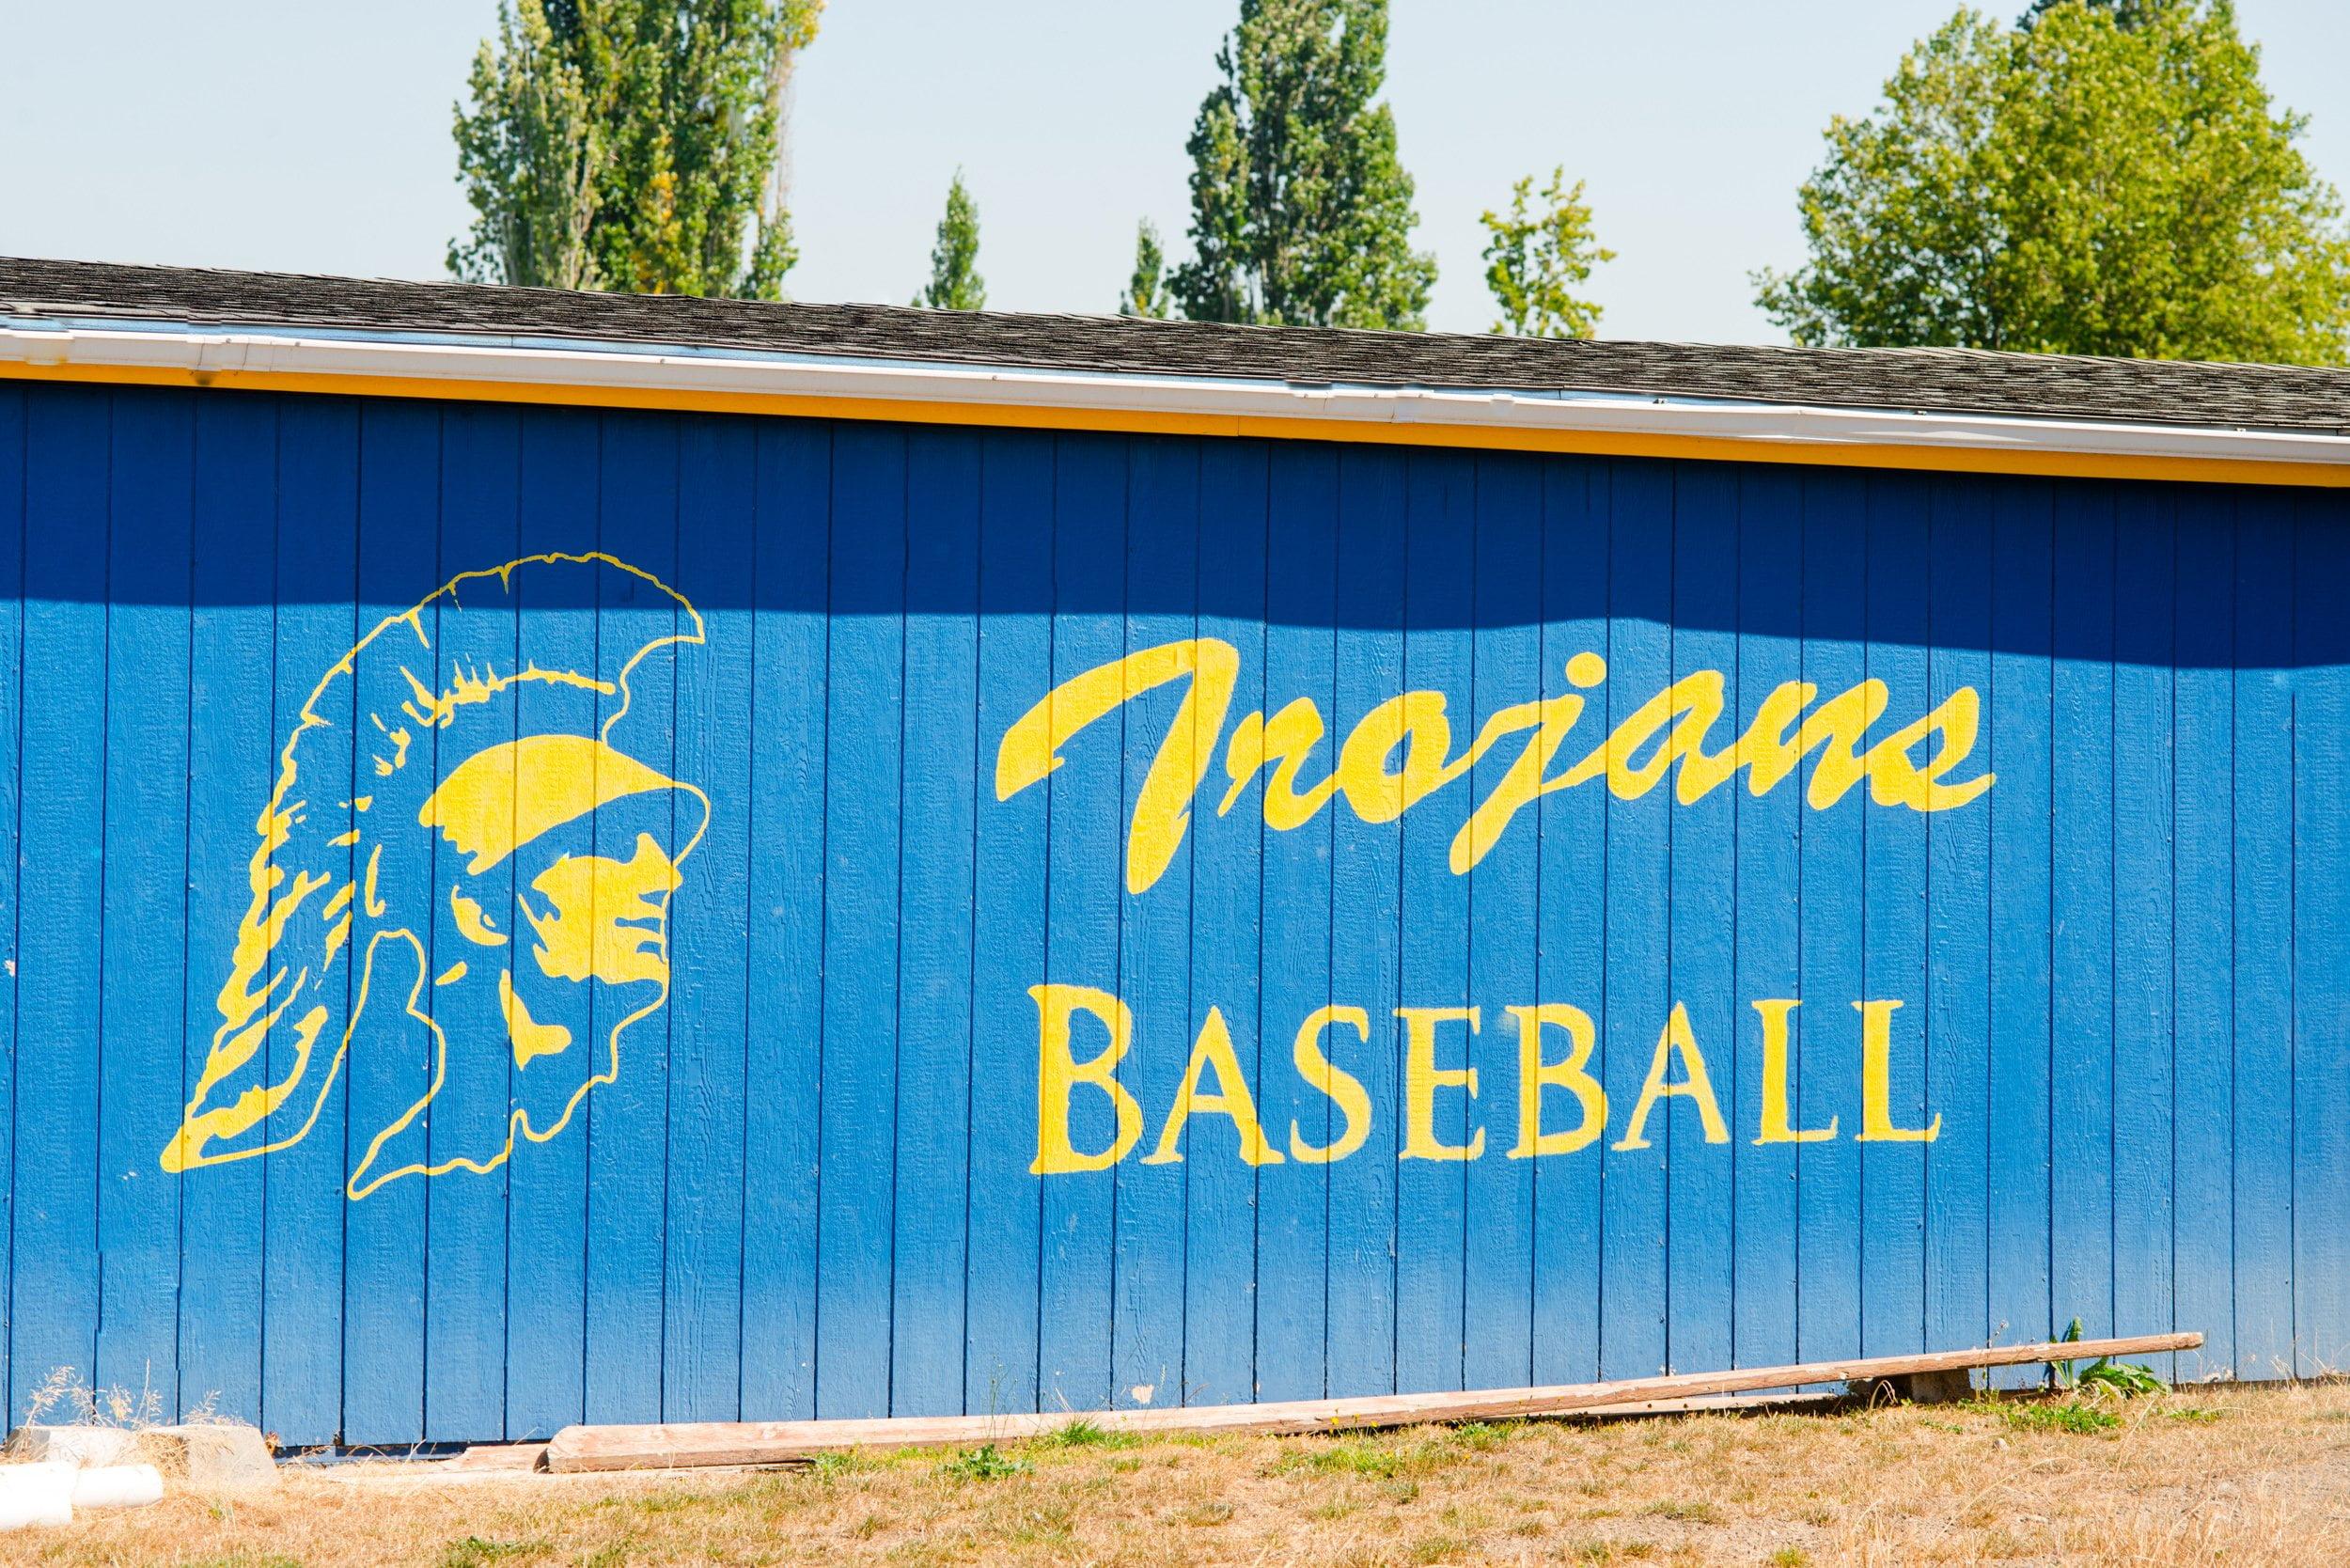 Trojans Baseball mural fife wa